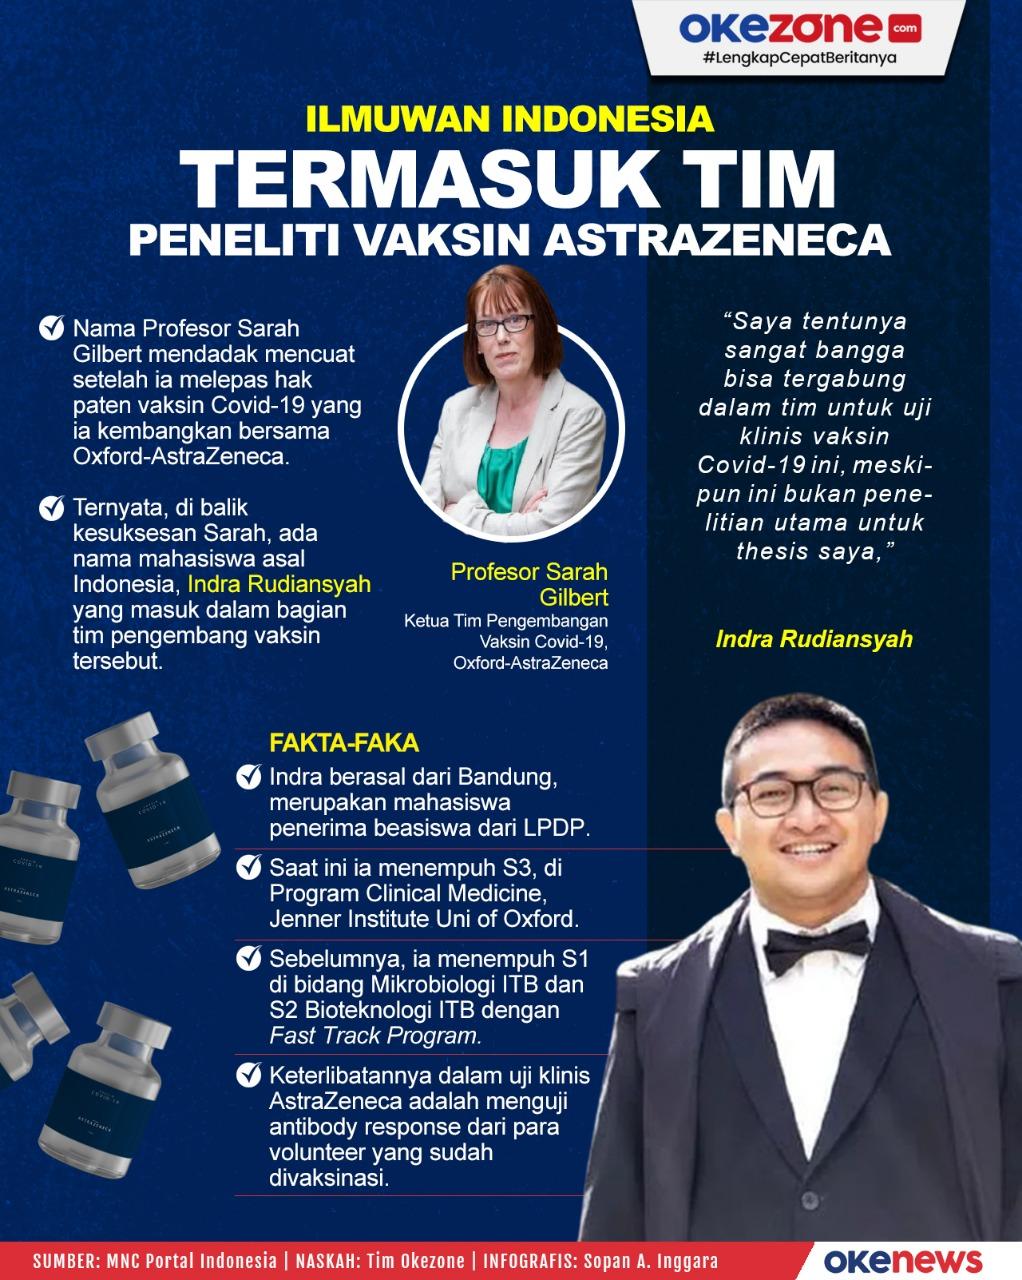 Ilmuwan Indonesia Termasuk Tim Peneliti Vaksin AstraZeneca -